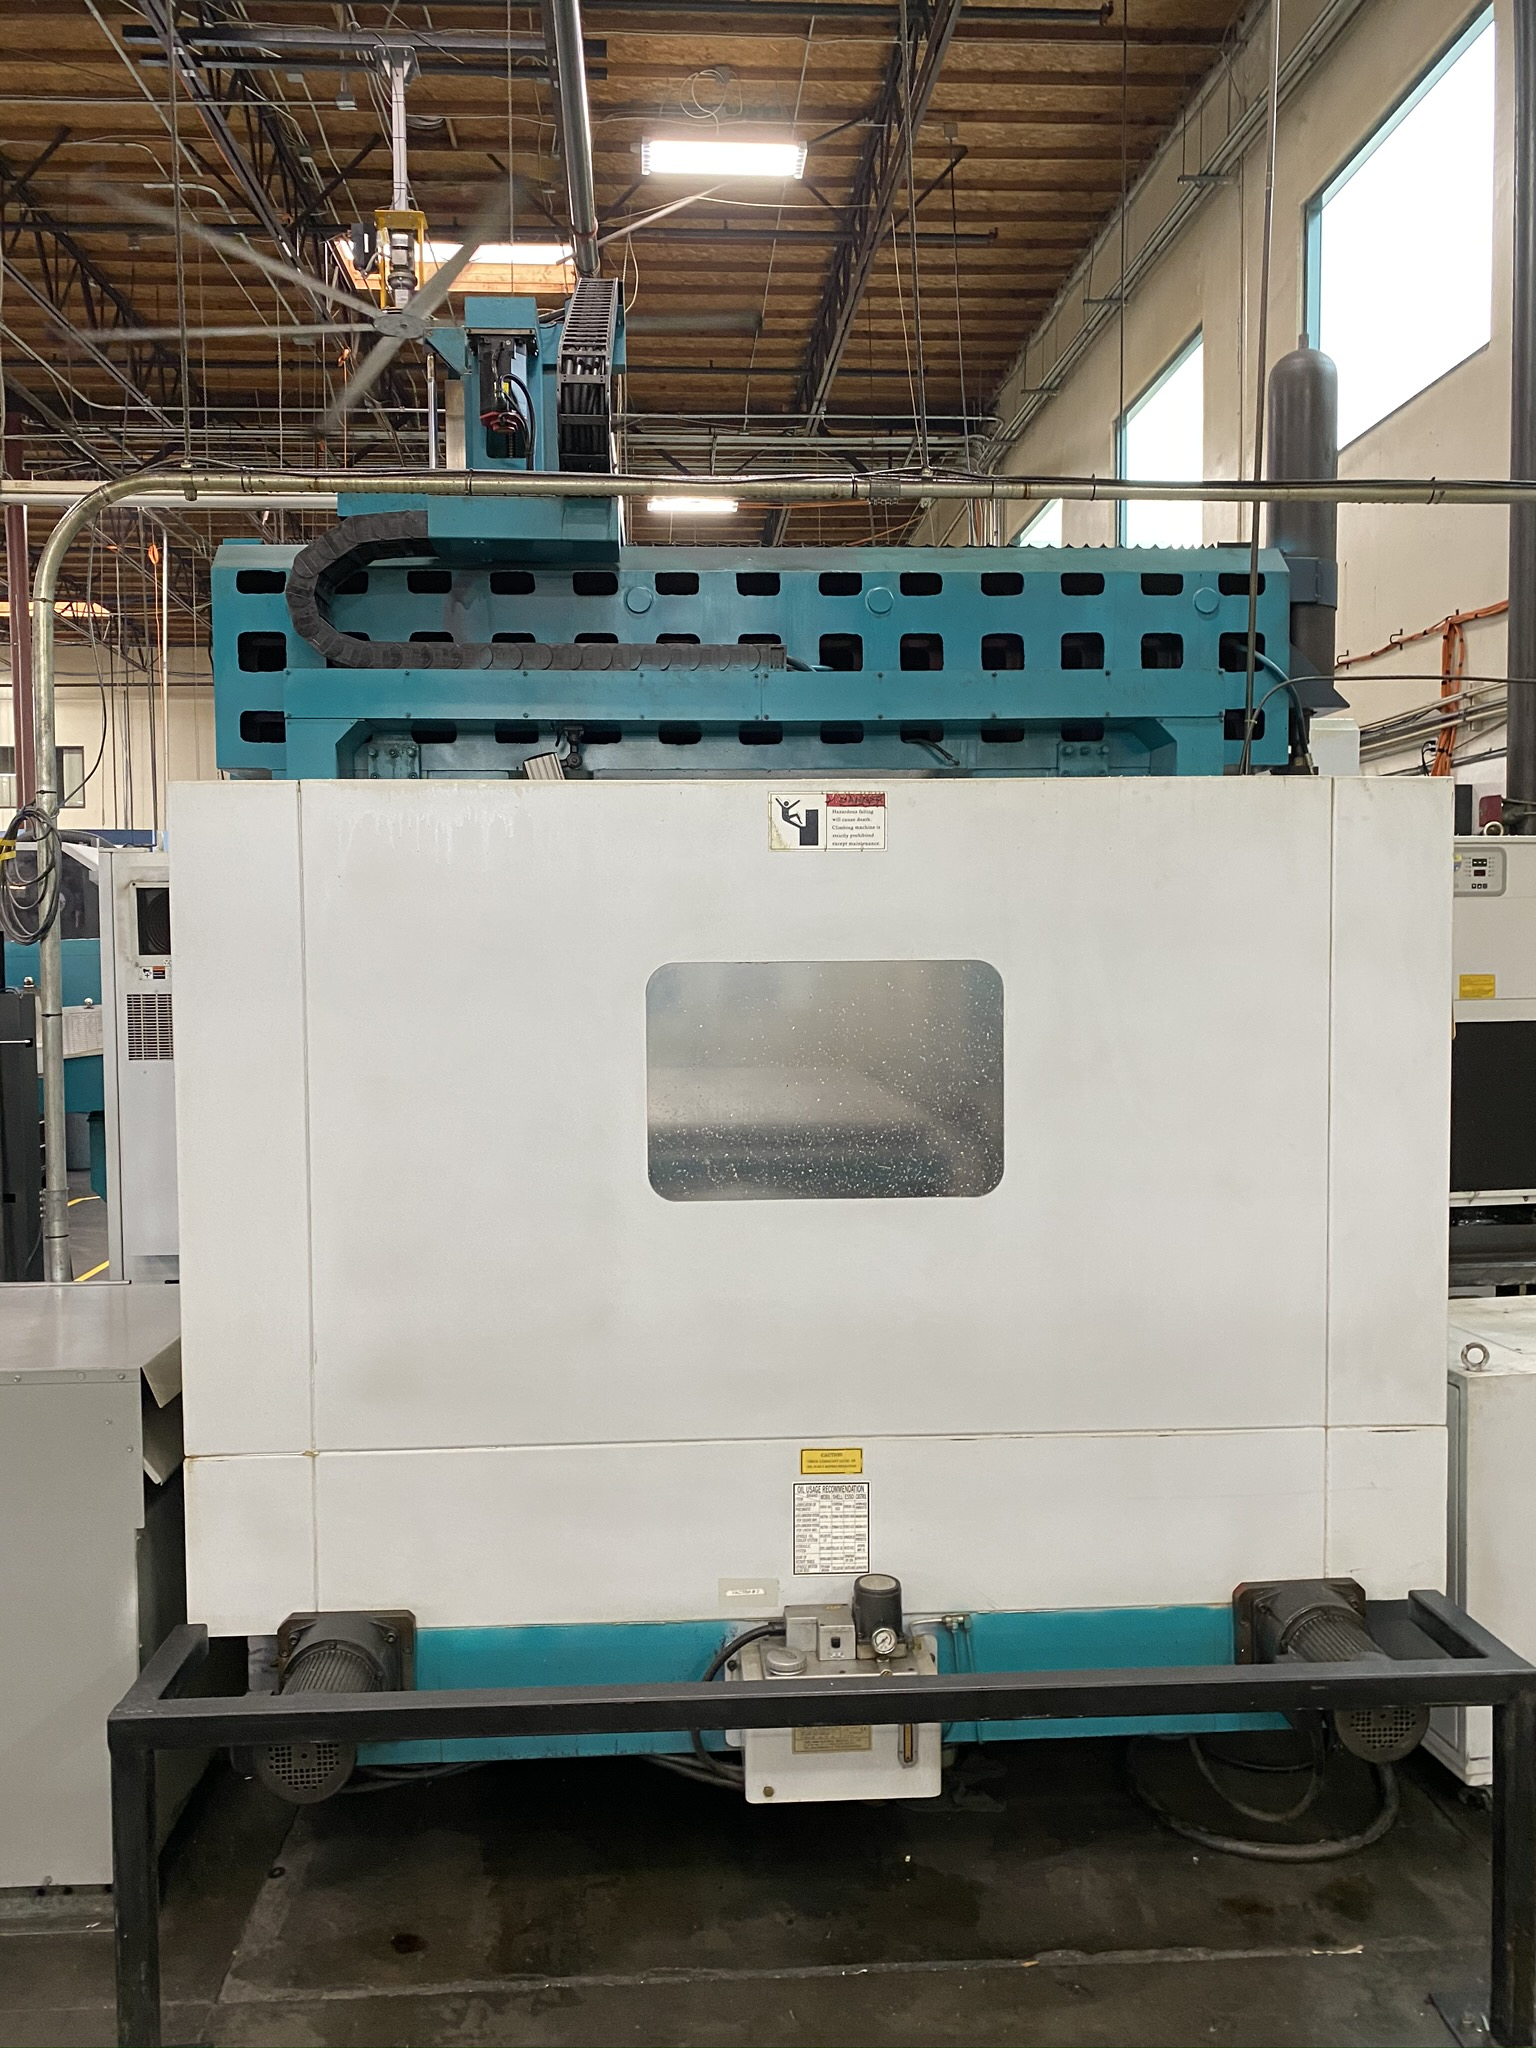 2005 SIGMA CNC DOUBLE COLUMN MACHINING CENTER, MODEL SDV-3219, FANUC 18IMB CNC CONTROL - Image 24 of 31